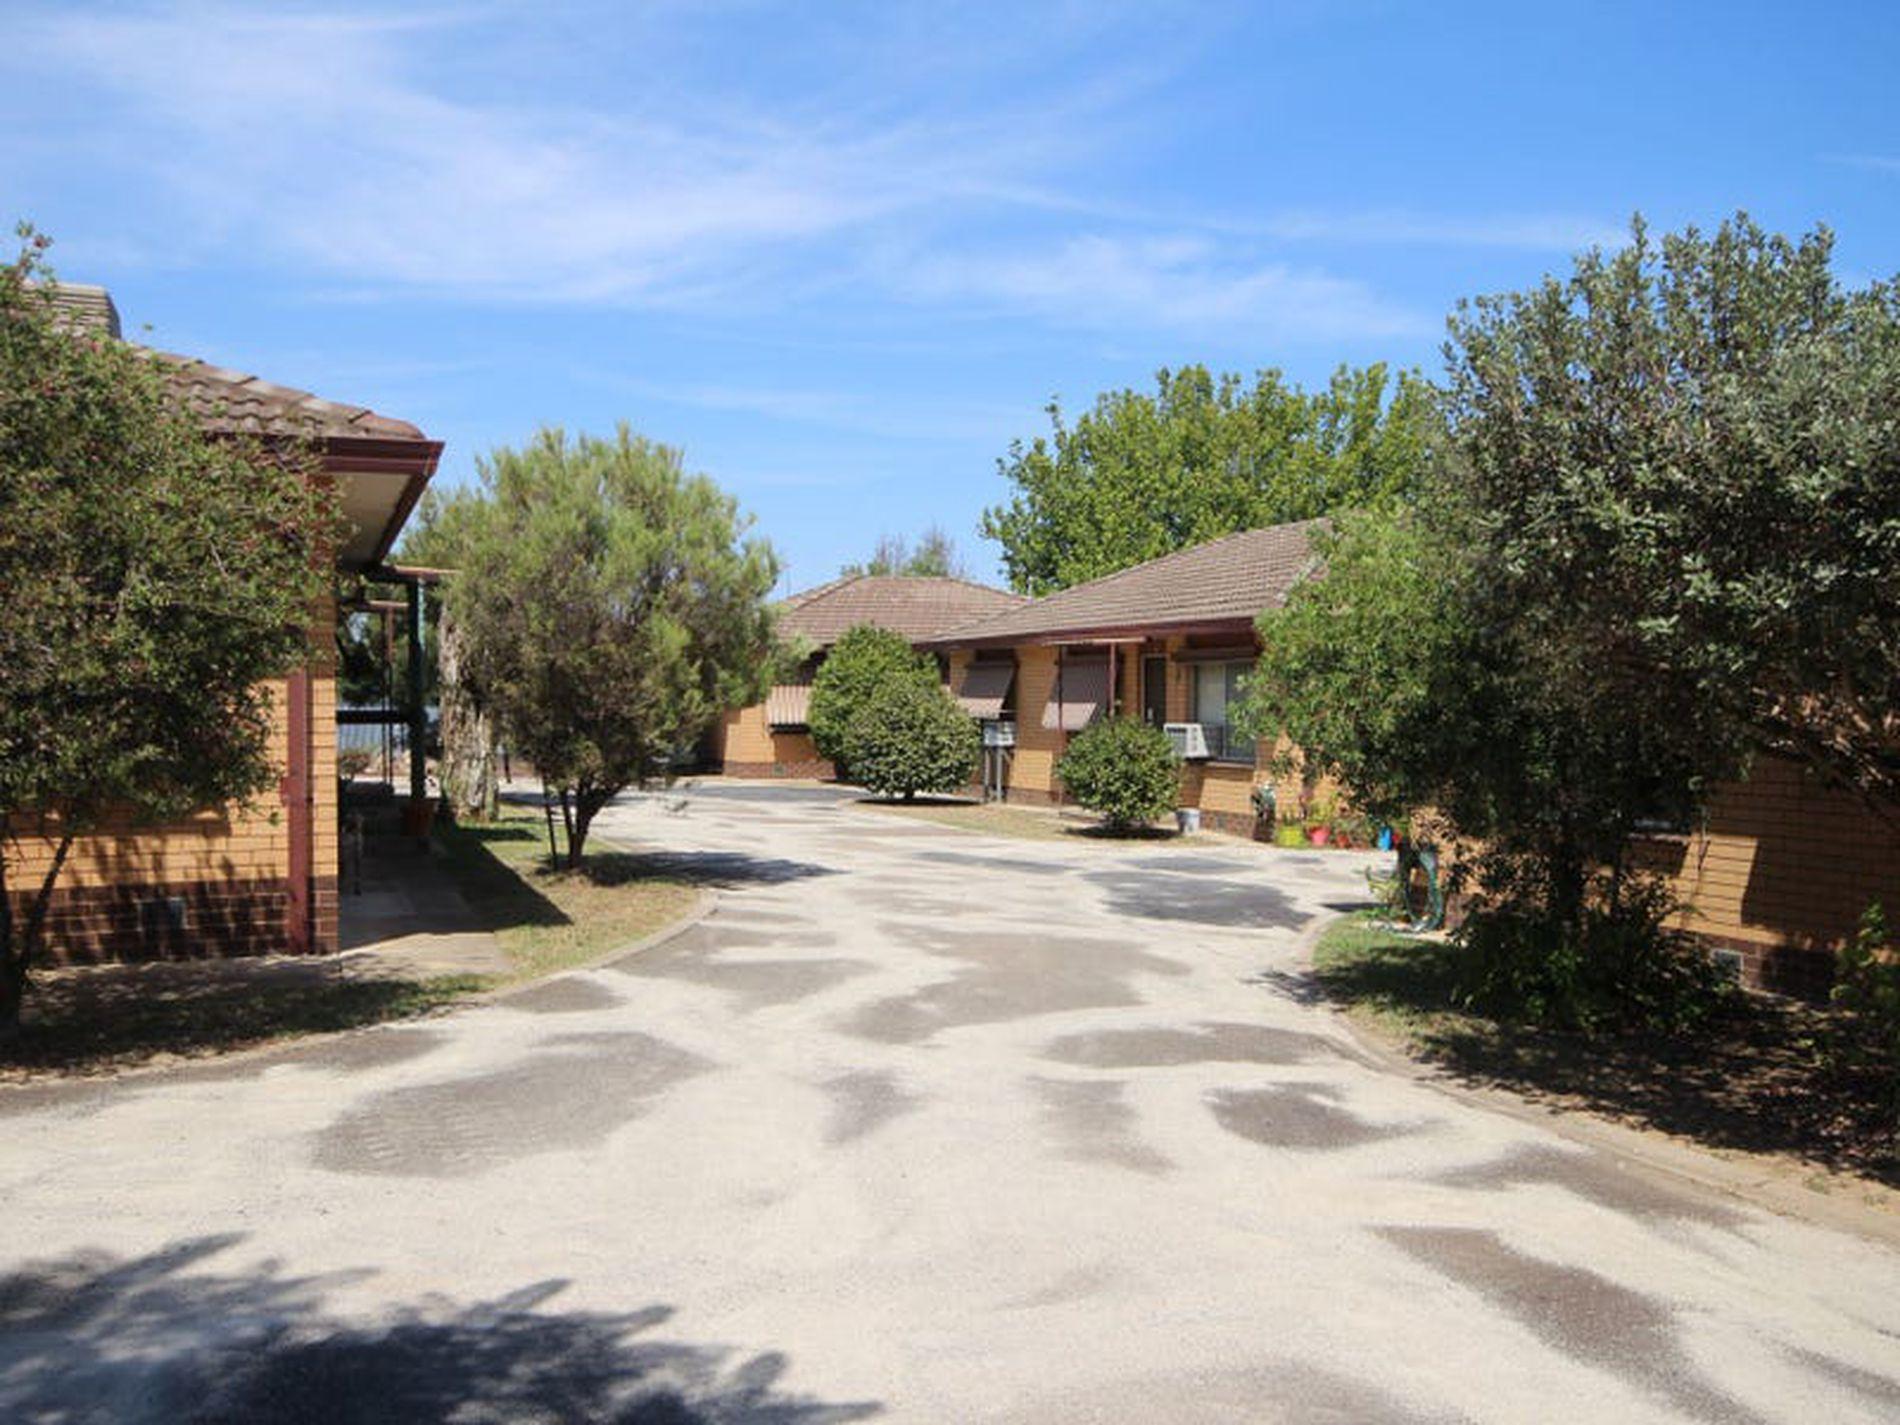 1 / 9A Graham Avenue, Wangaratta